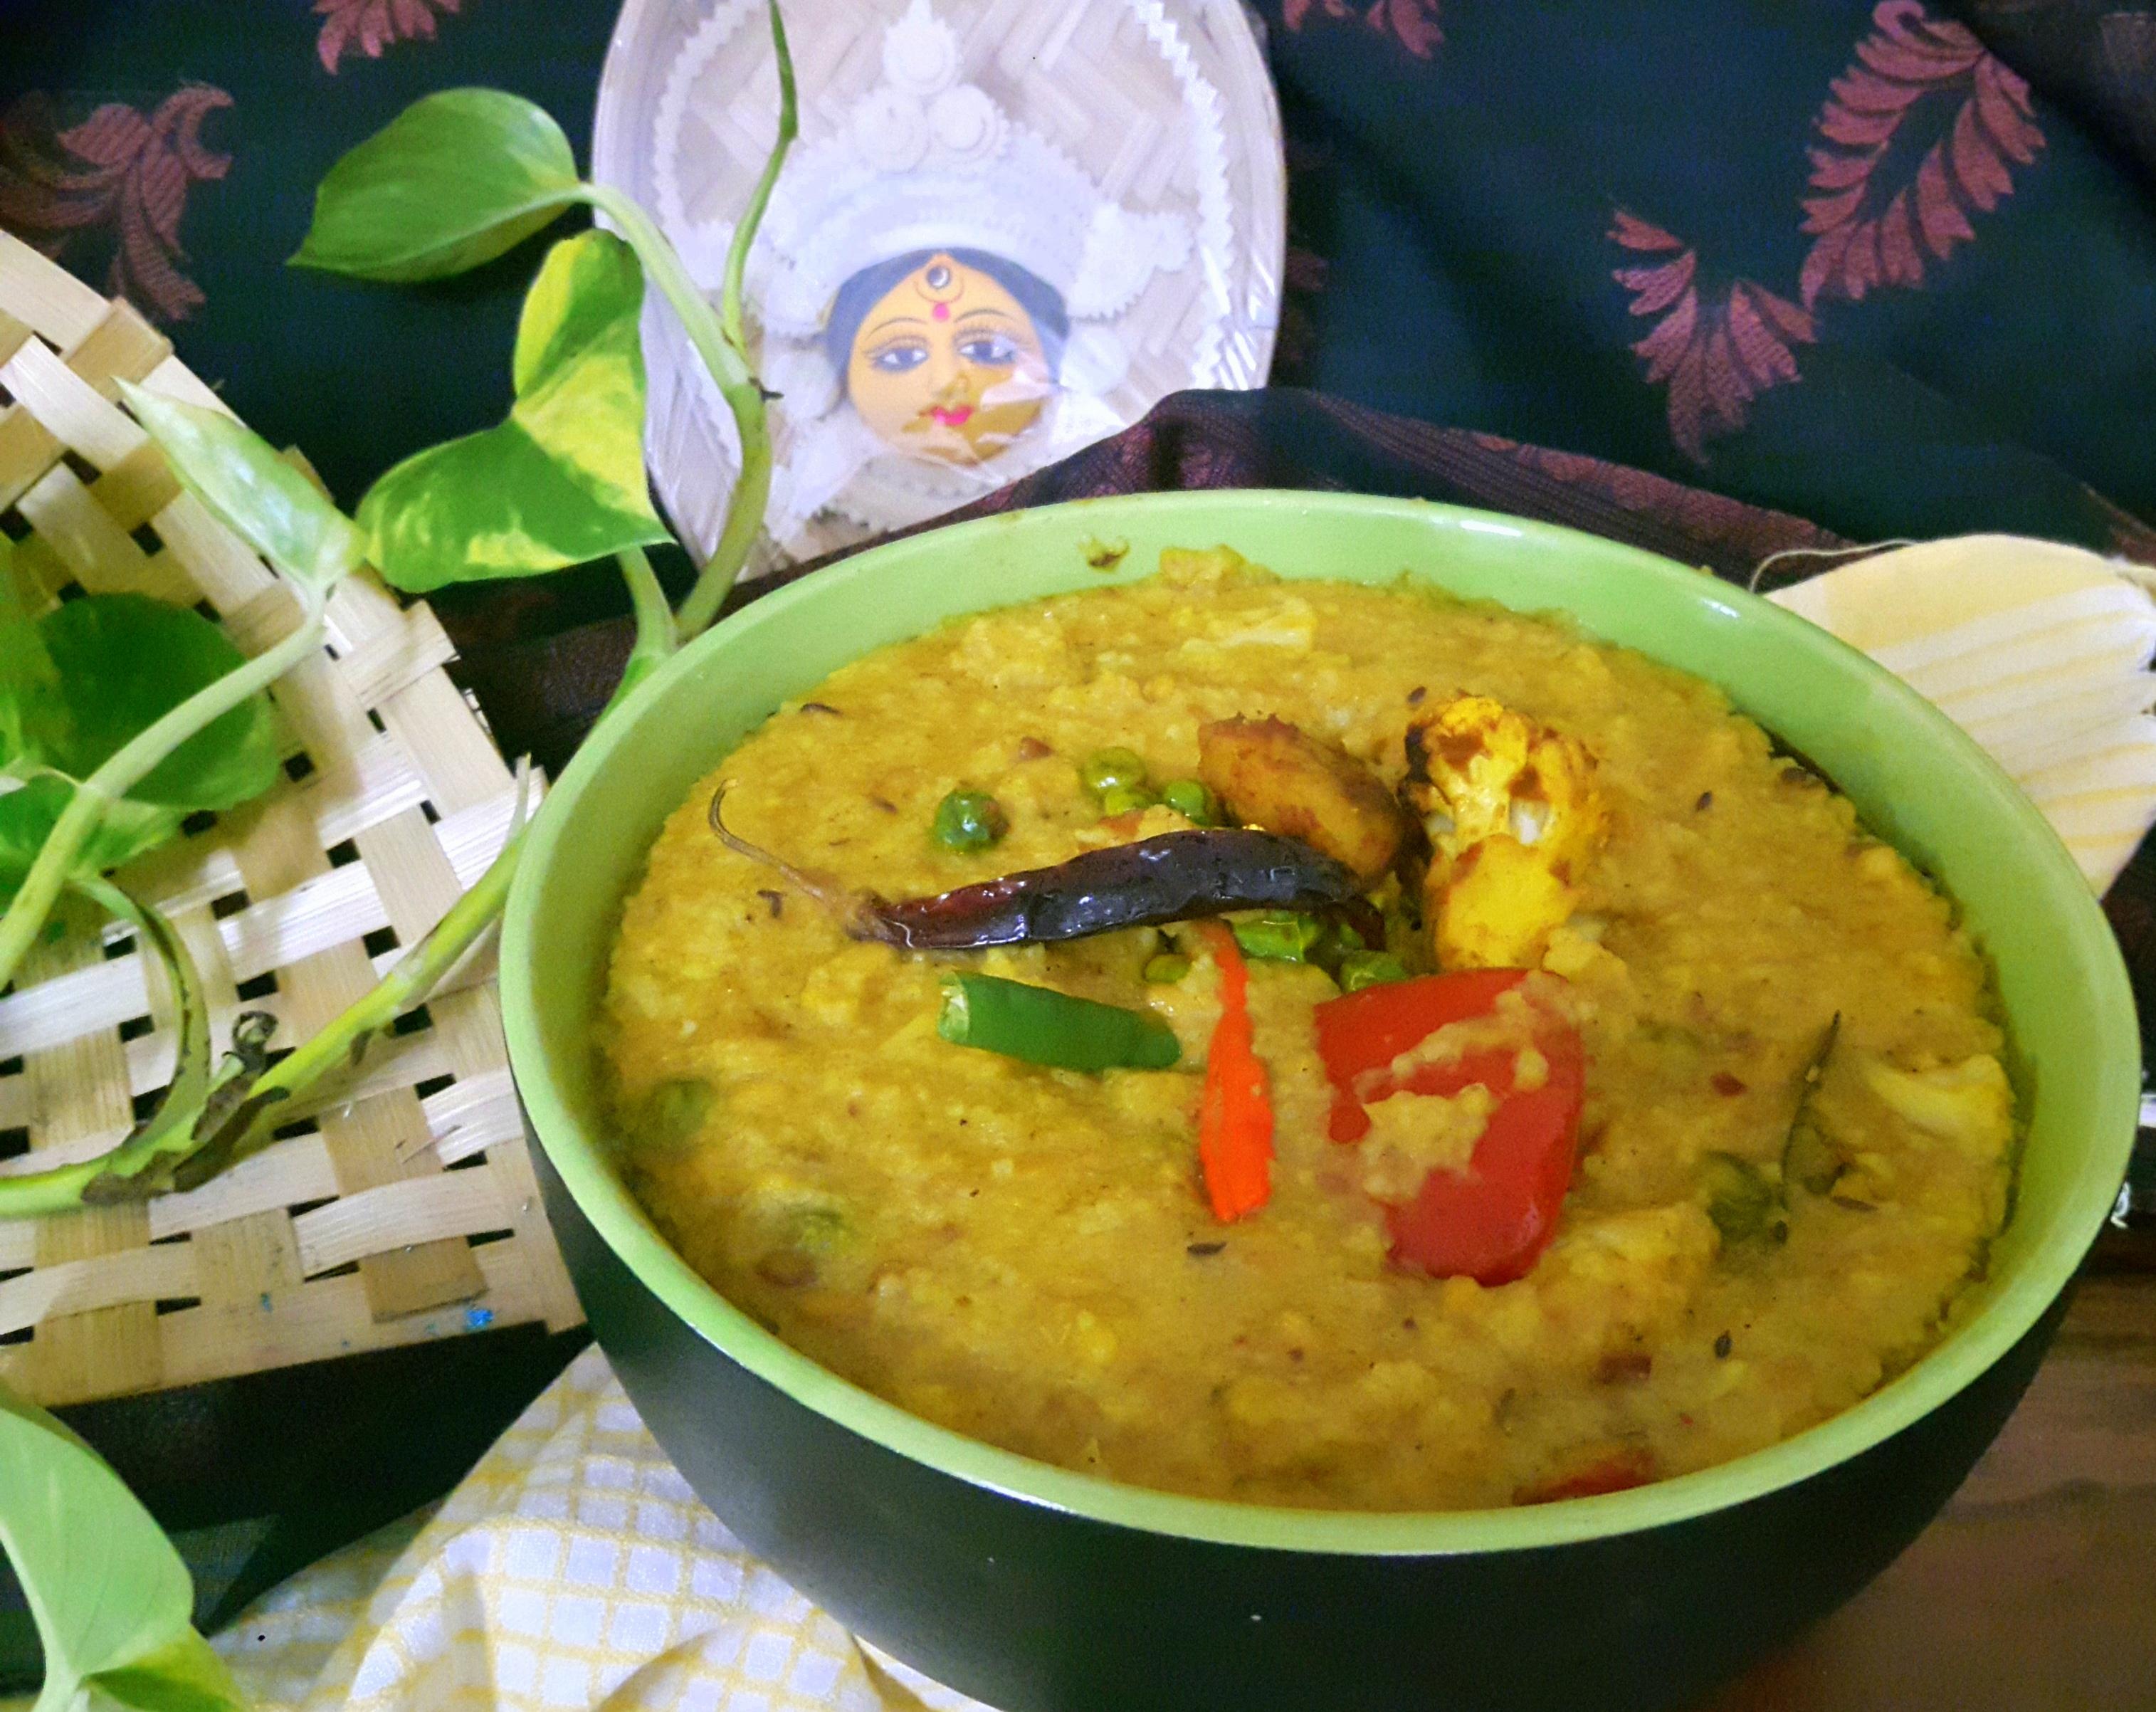 Bhog Khichadi (Bhoger Khichuri Rice and Lentil porridge)